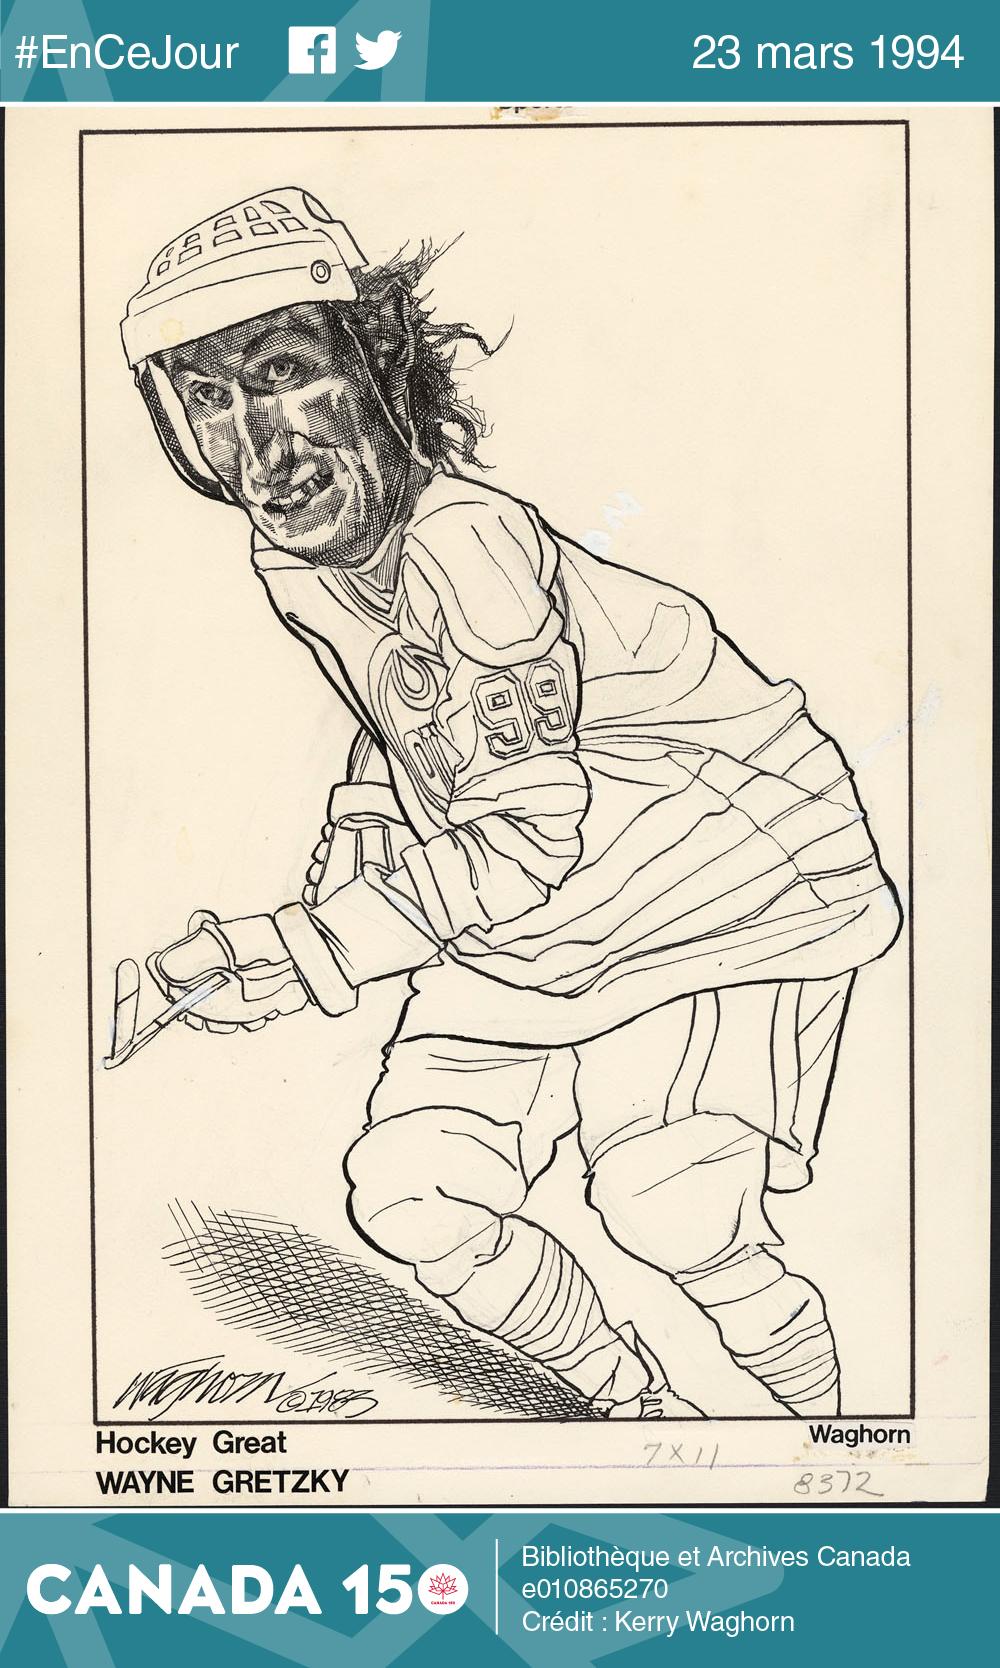 Caricature de Wayne Gretzky jouant au hockey, 1983.